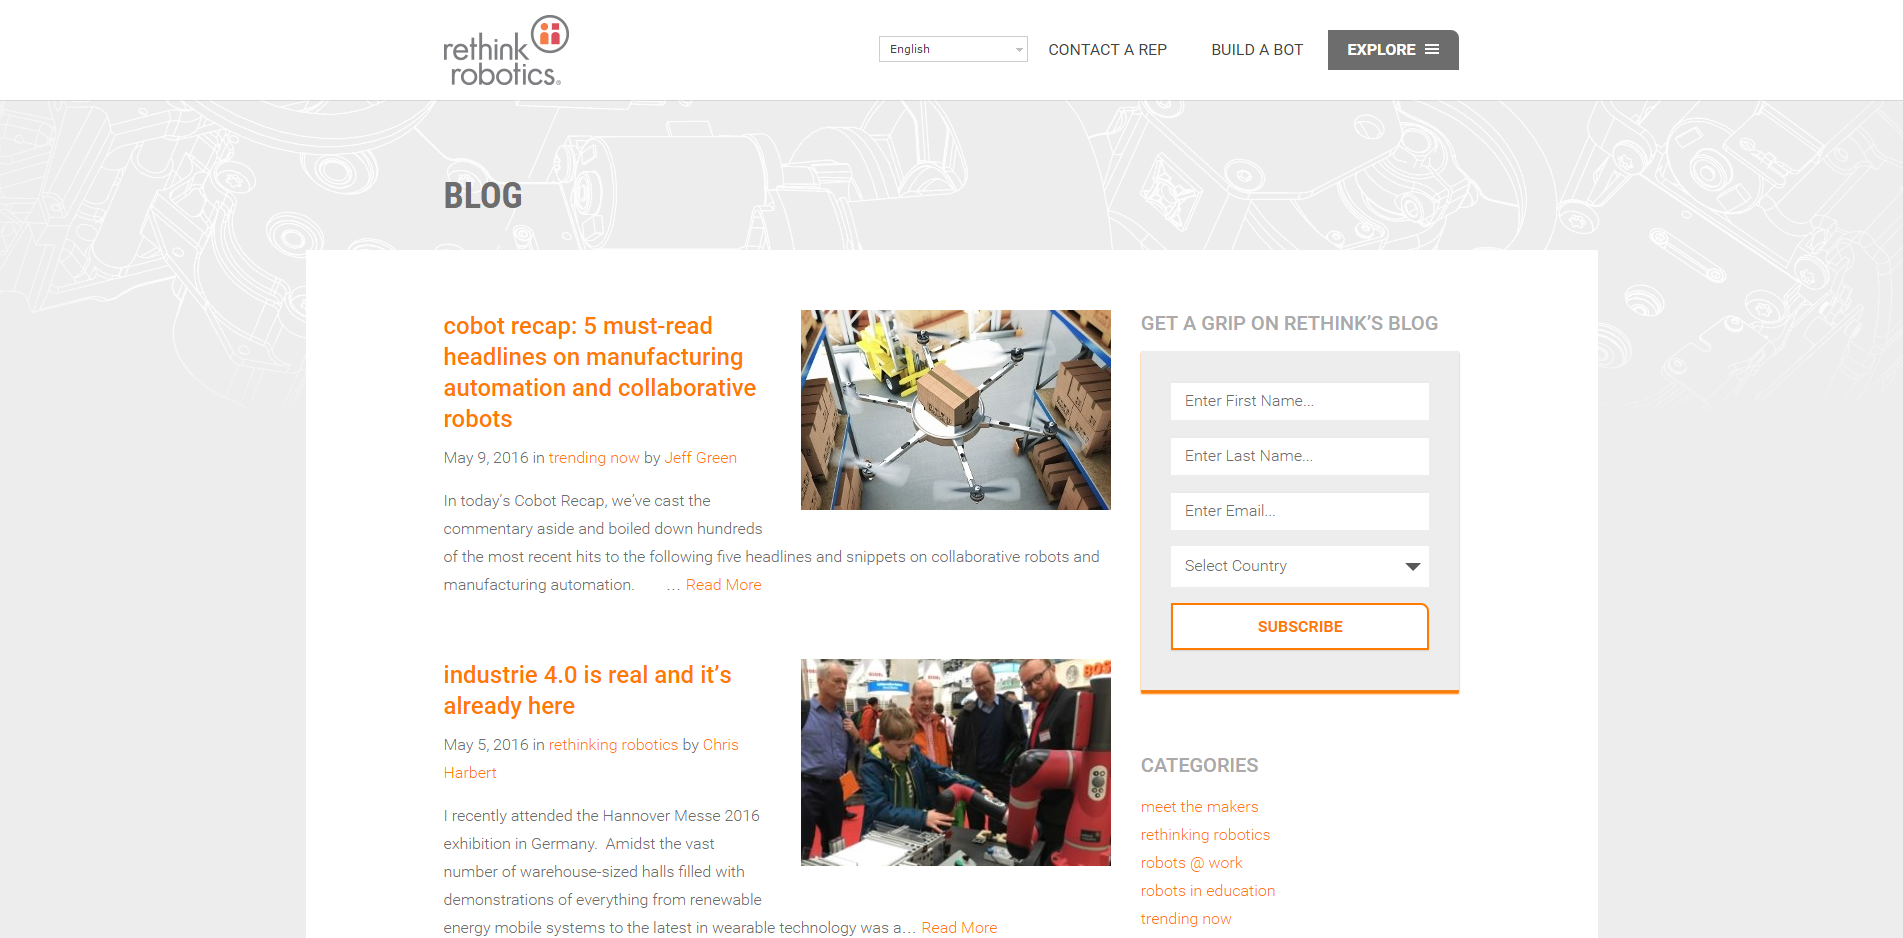 Rethinking_Robotics_with_Baxter___Rethink_Robotics_Blog.png